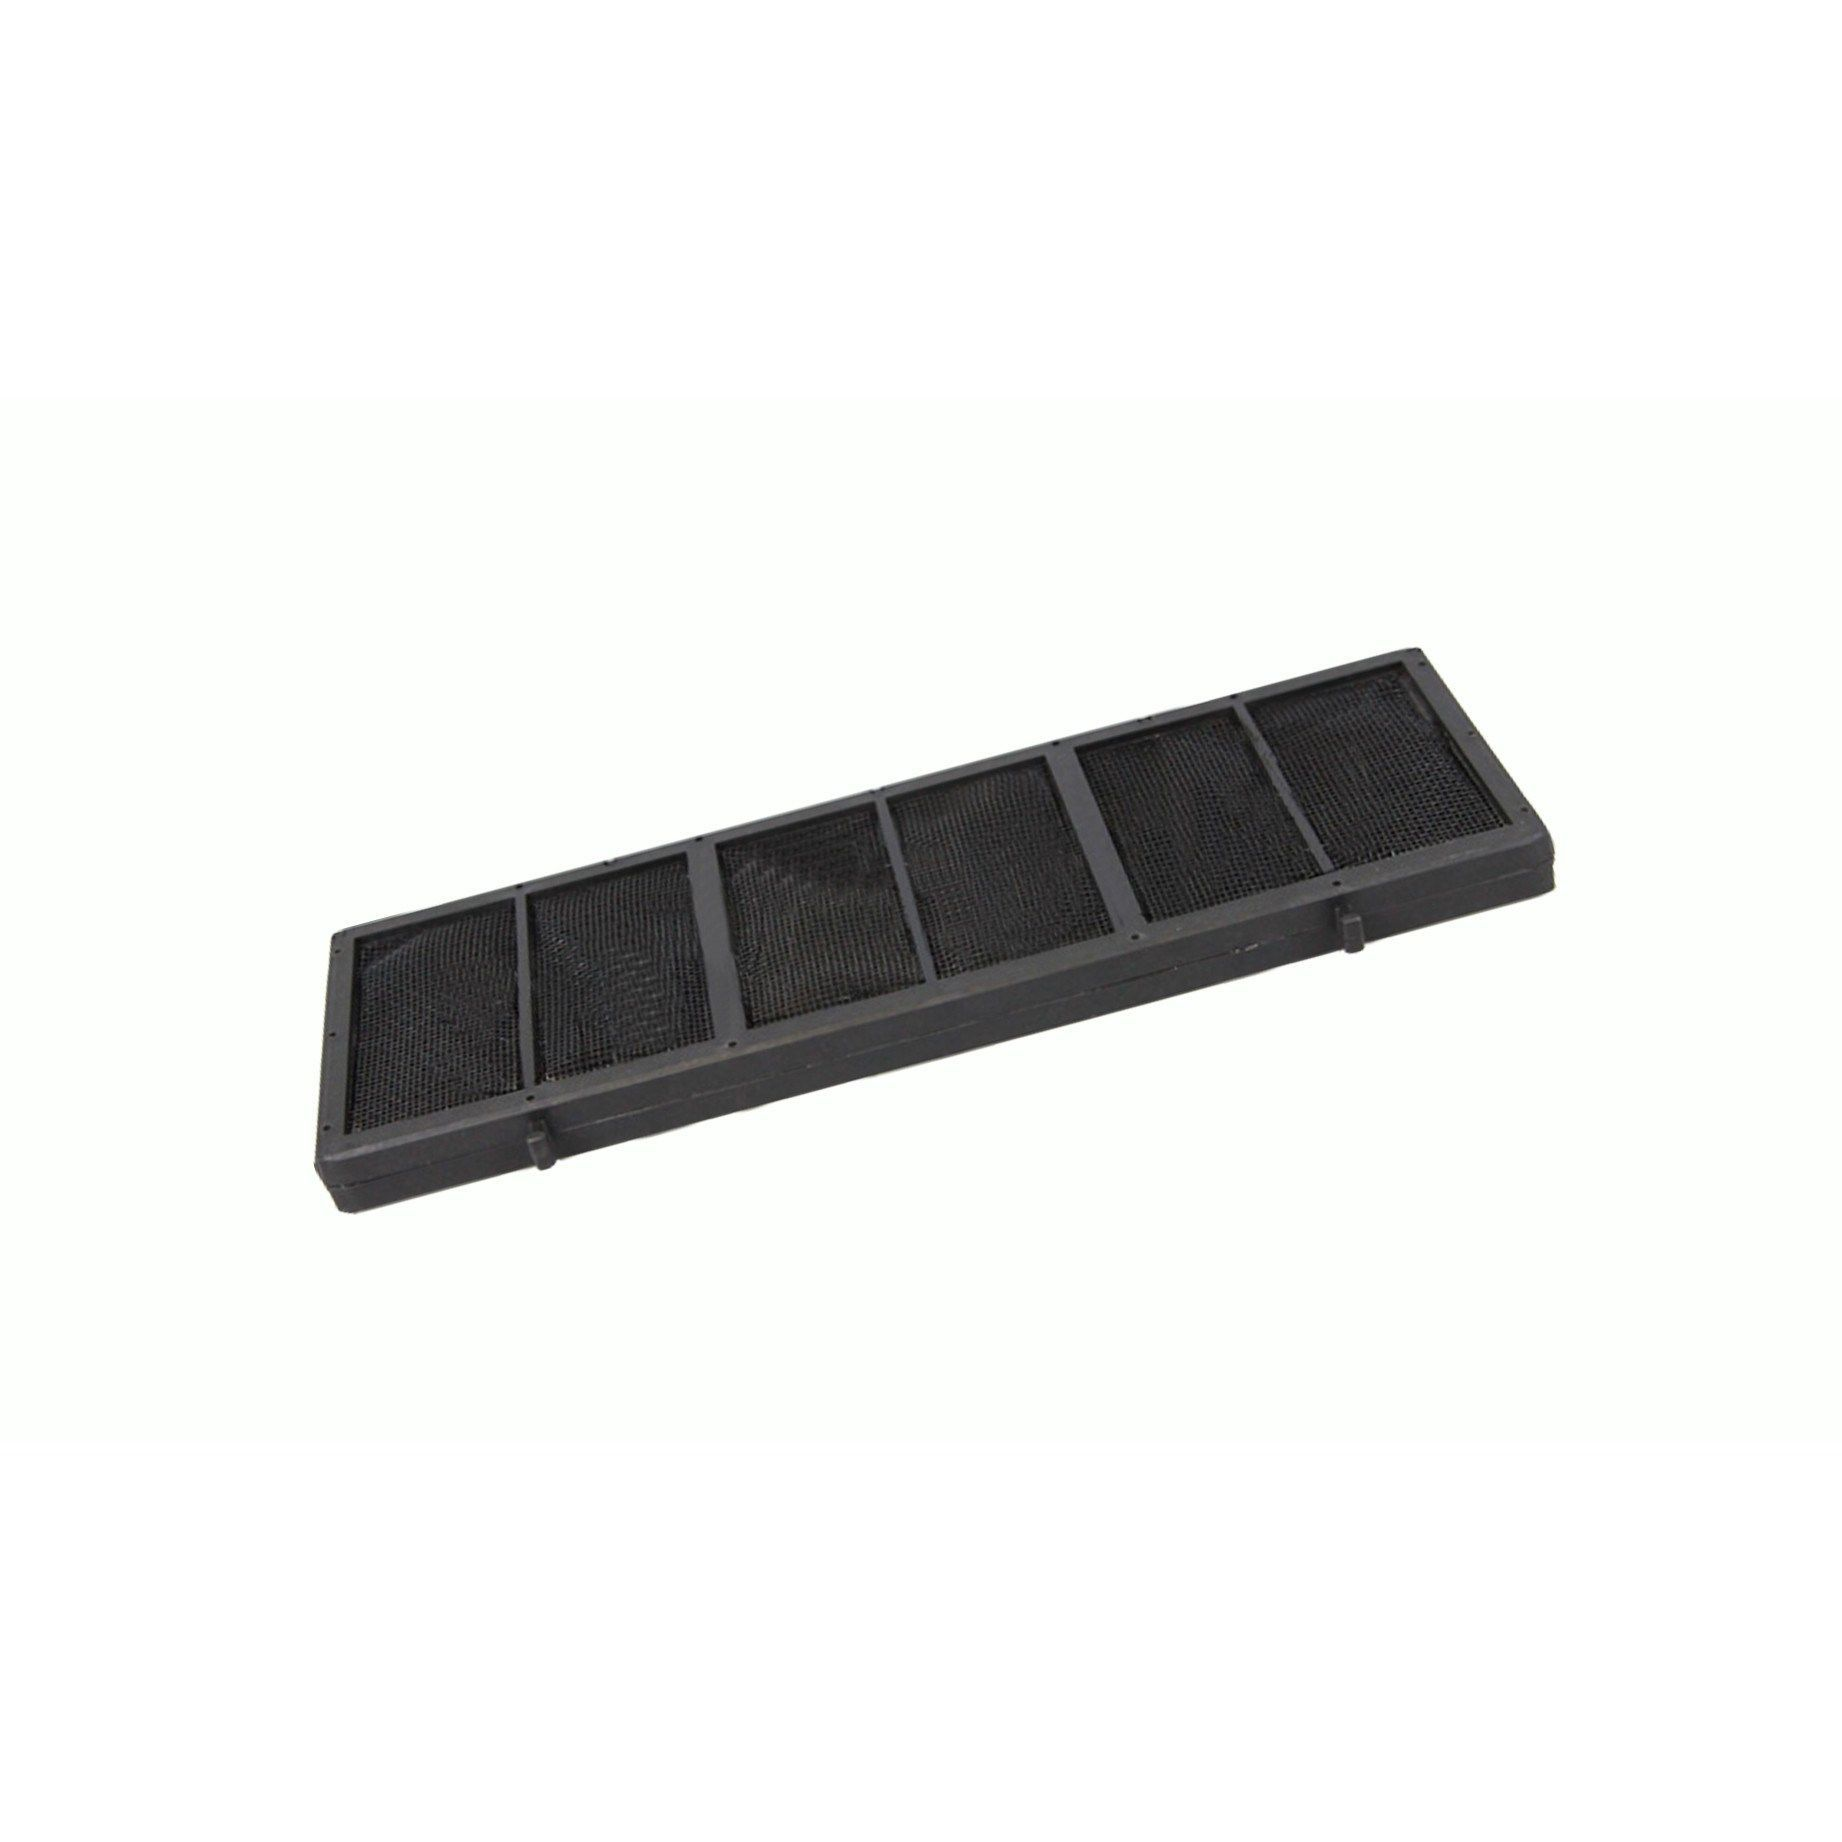 45da6ab017eca Oreck Air Purifier Filter | Oreck Part # AP1PKP | Fits Tabletop ...